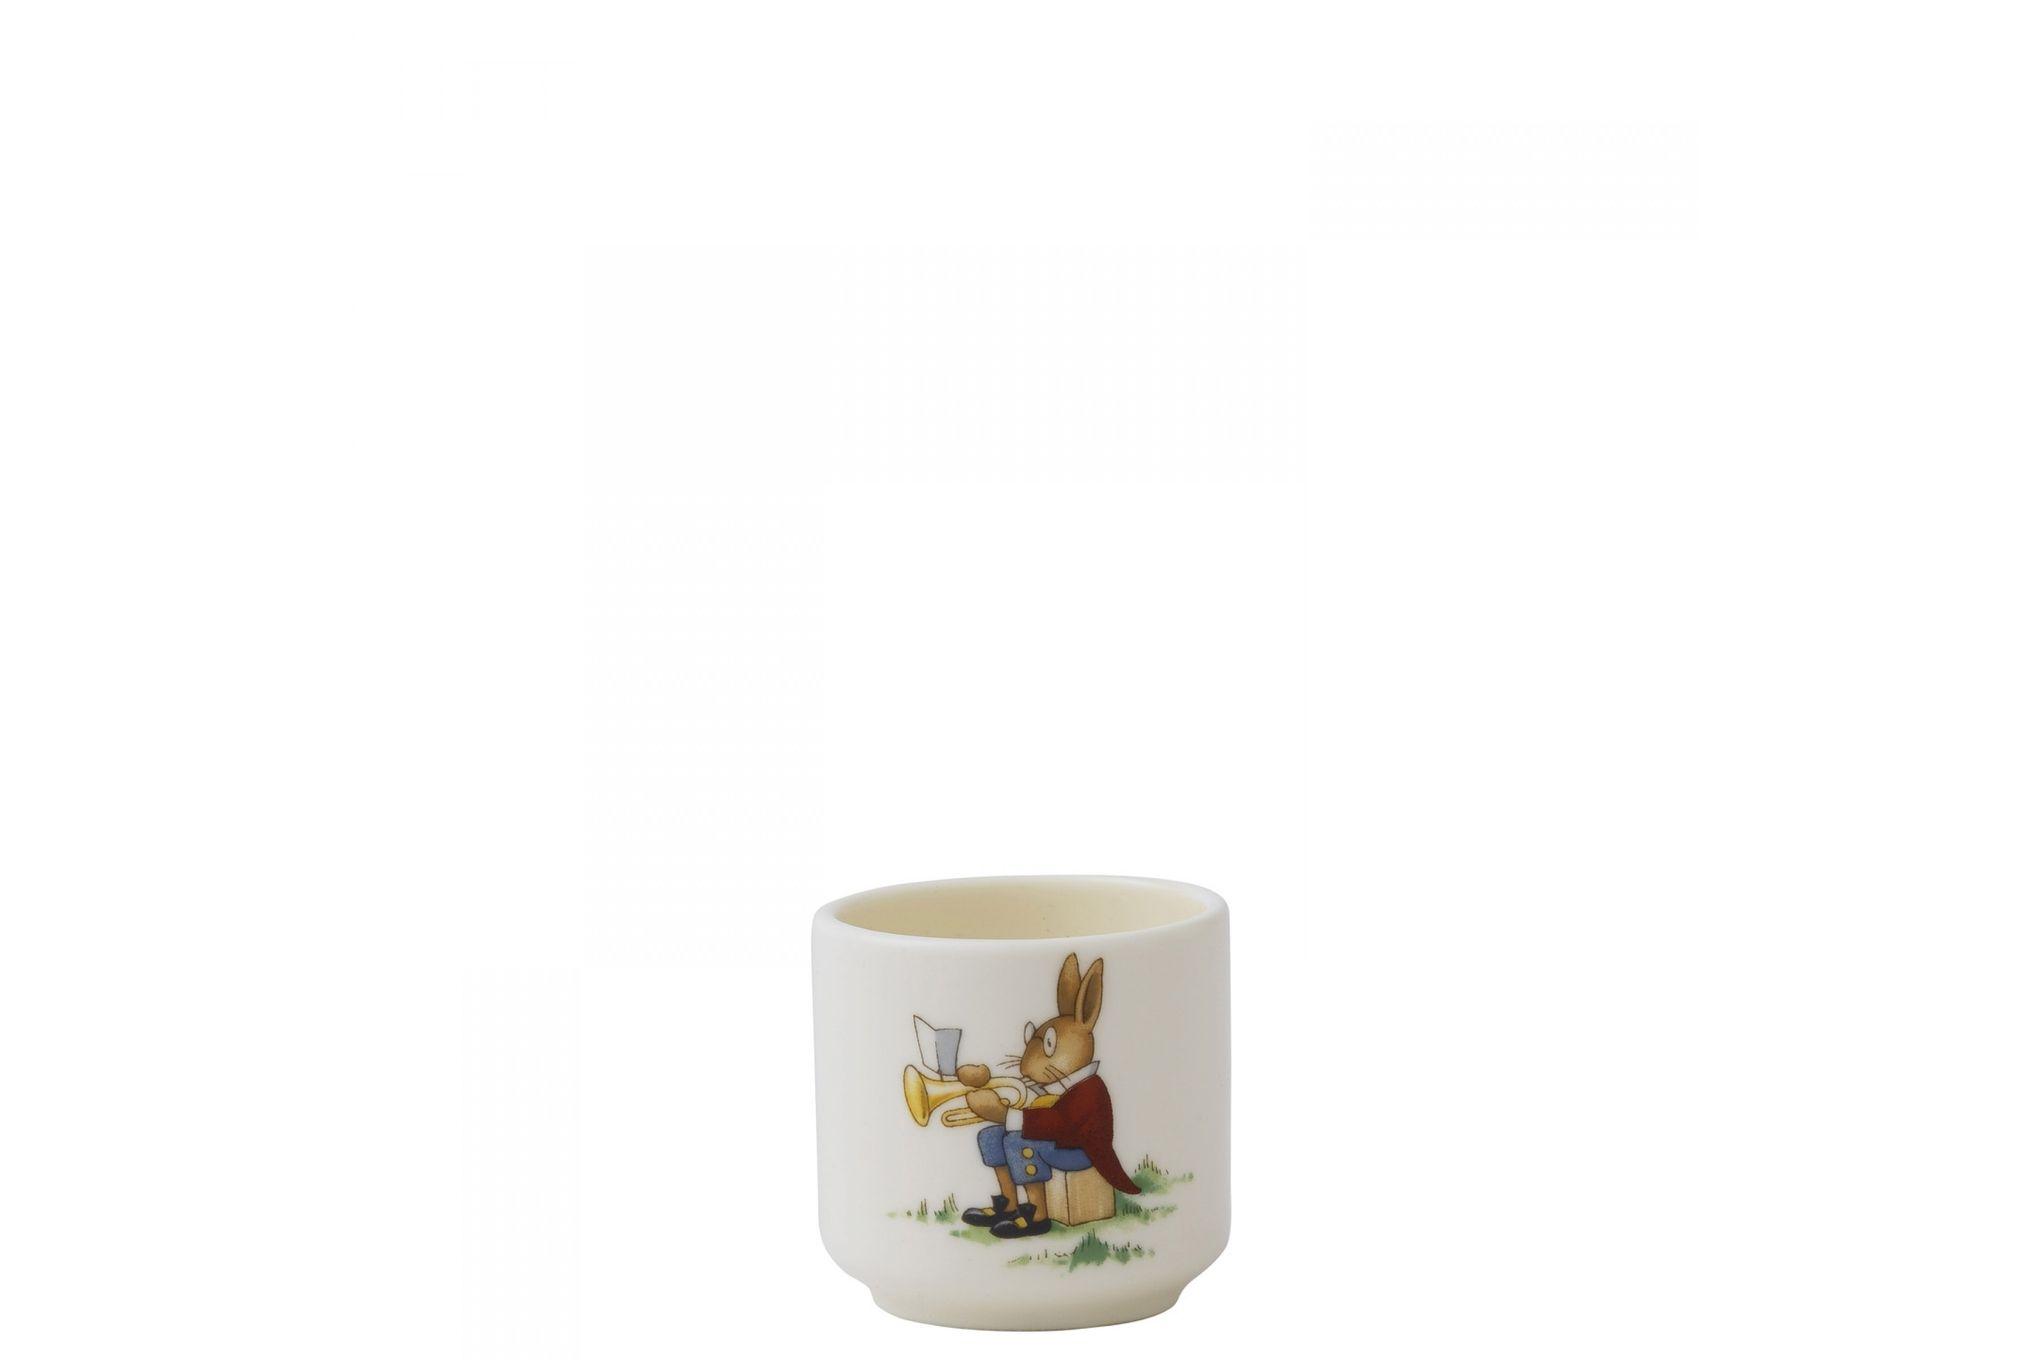 Royal Doulton Bunnykins Egg Cup Designs Vary thumb 1